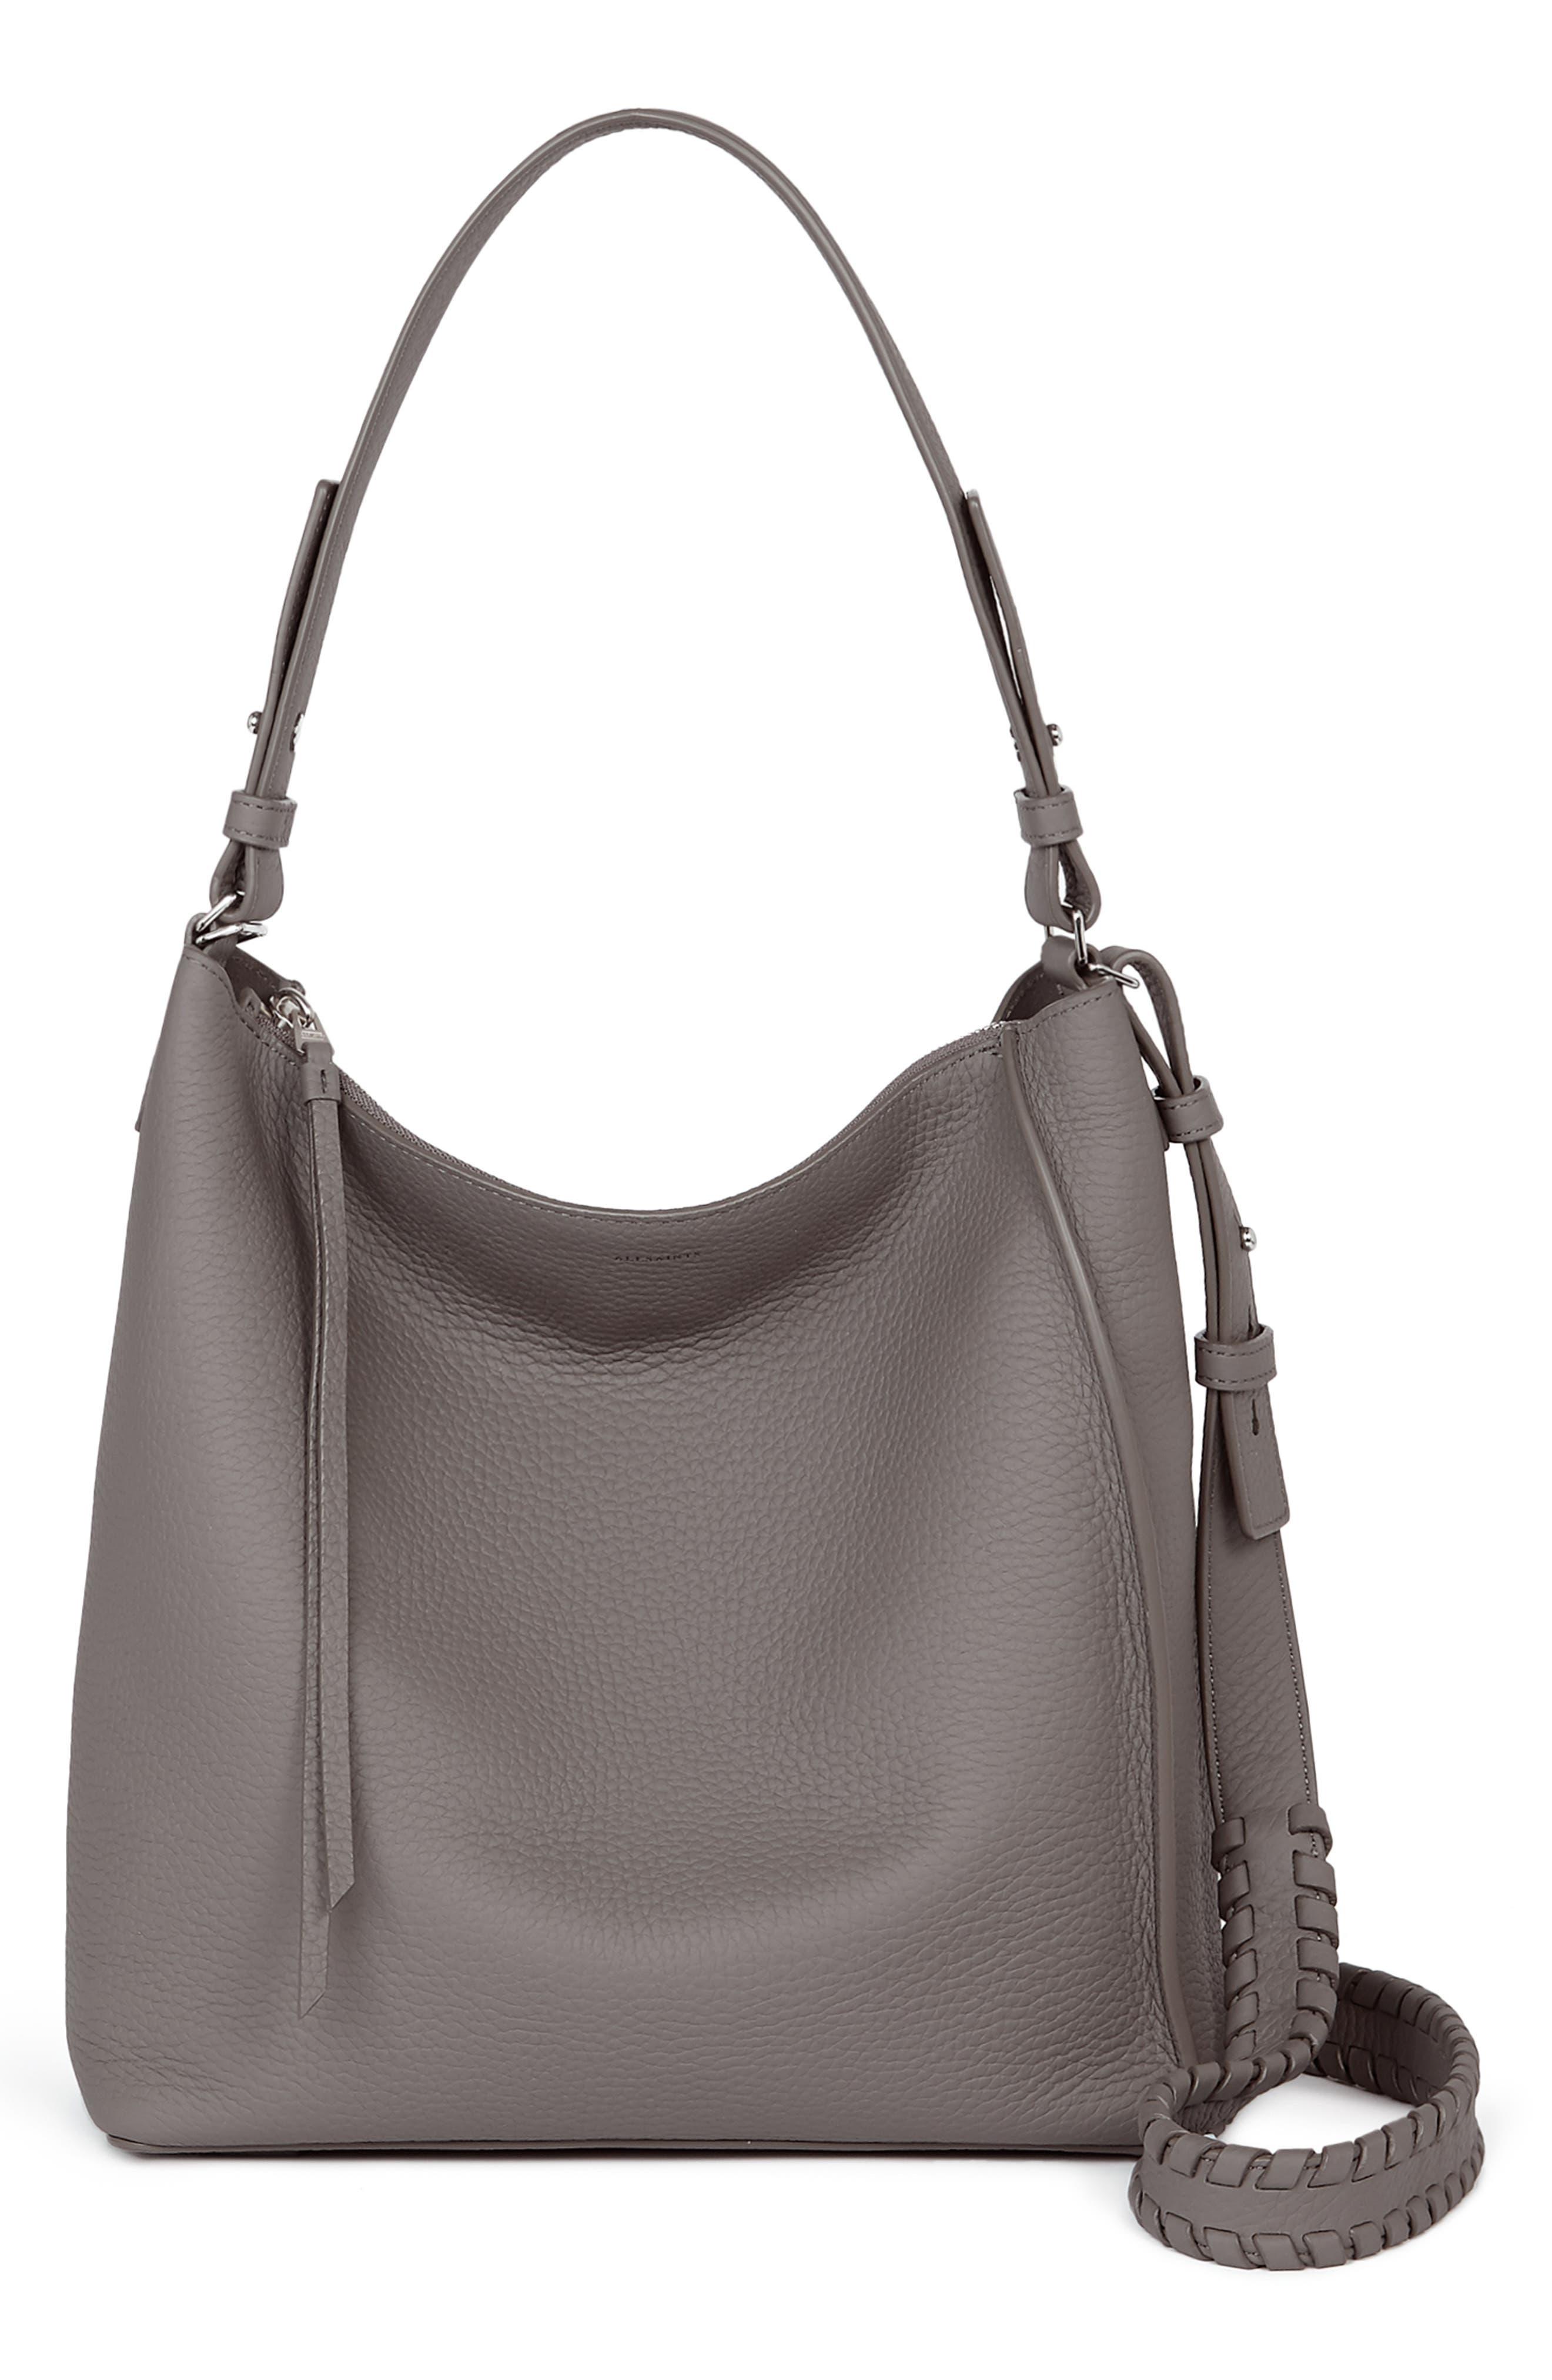 4d3b93b43cb Allsaints  Kita  Leather Shoulder crossbody Bag - Grey